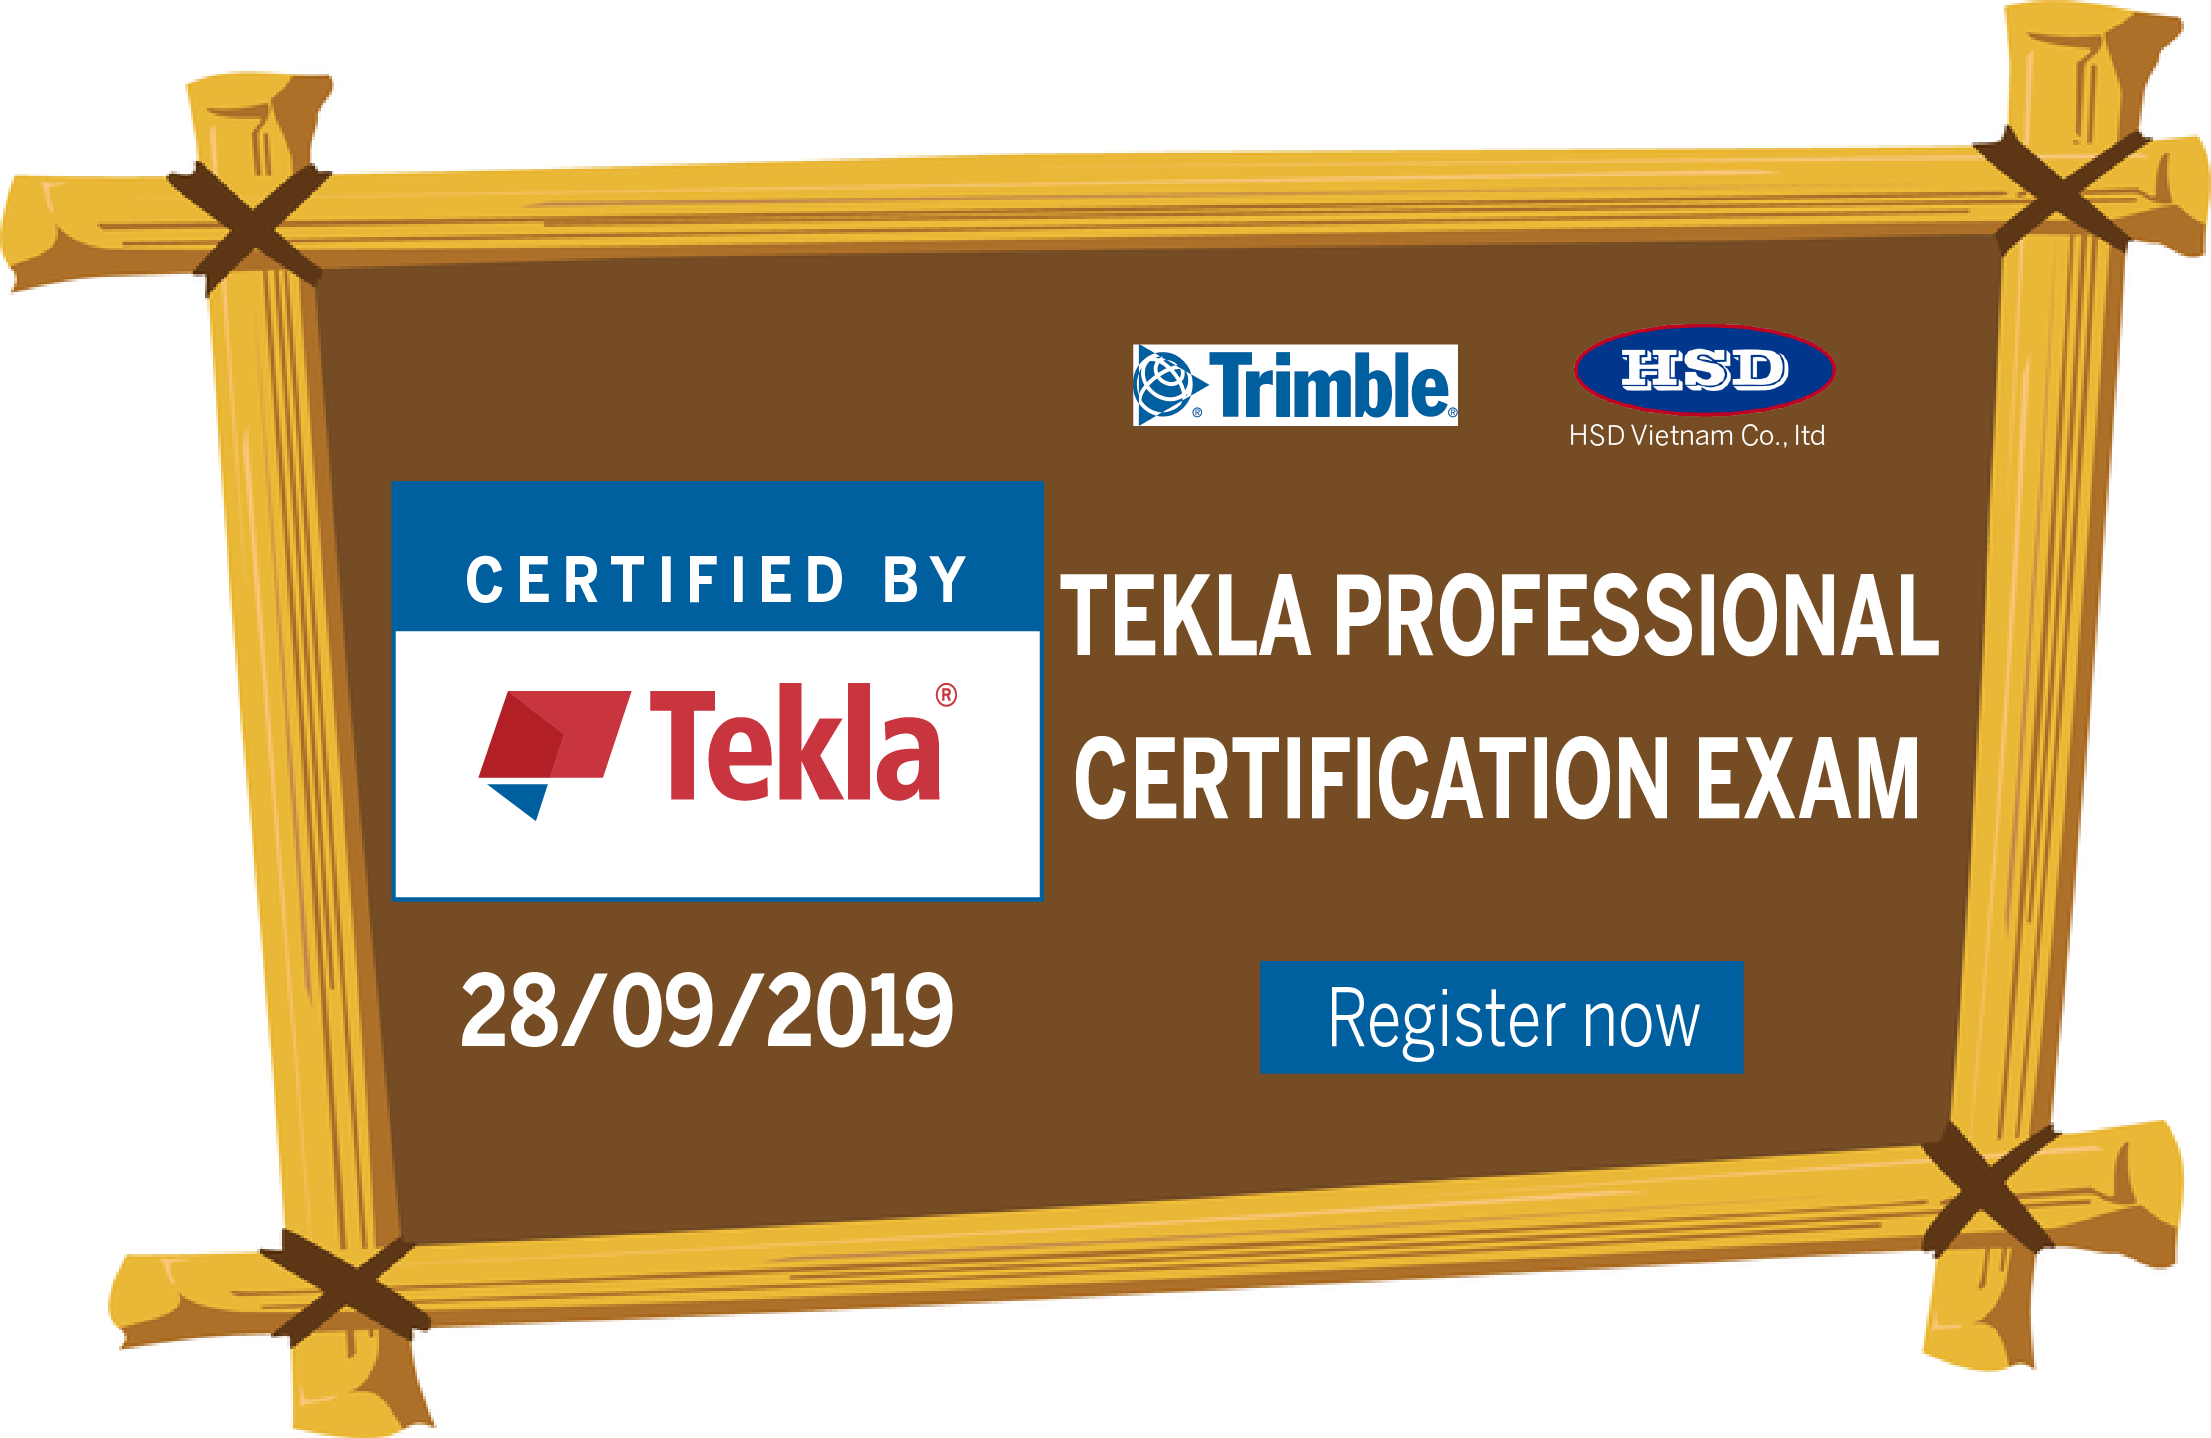 Tekla Professional Certificate 2019